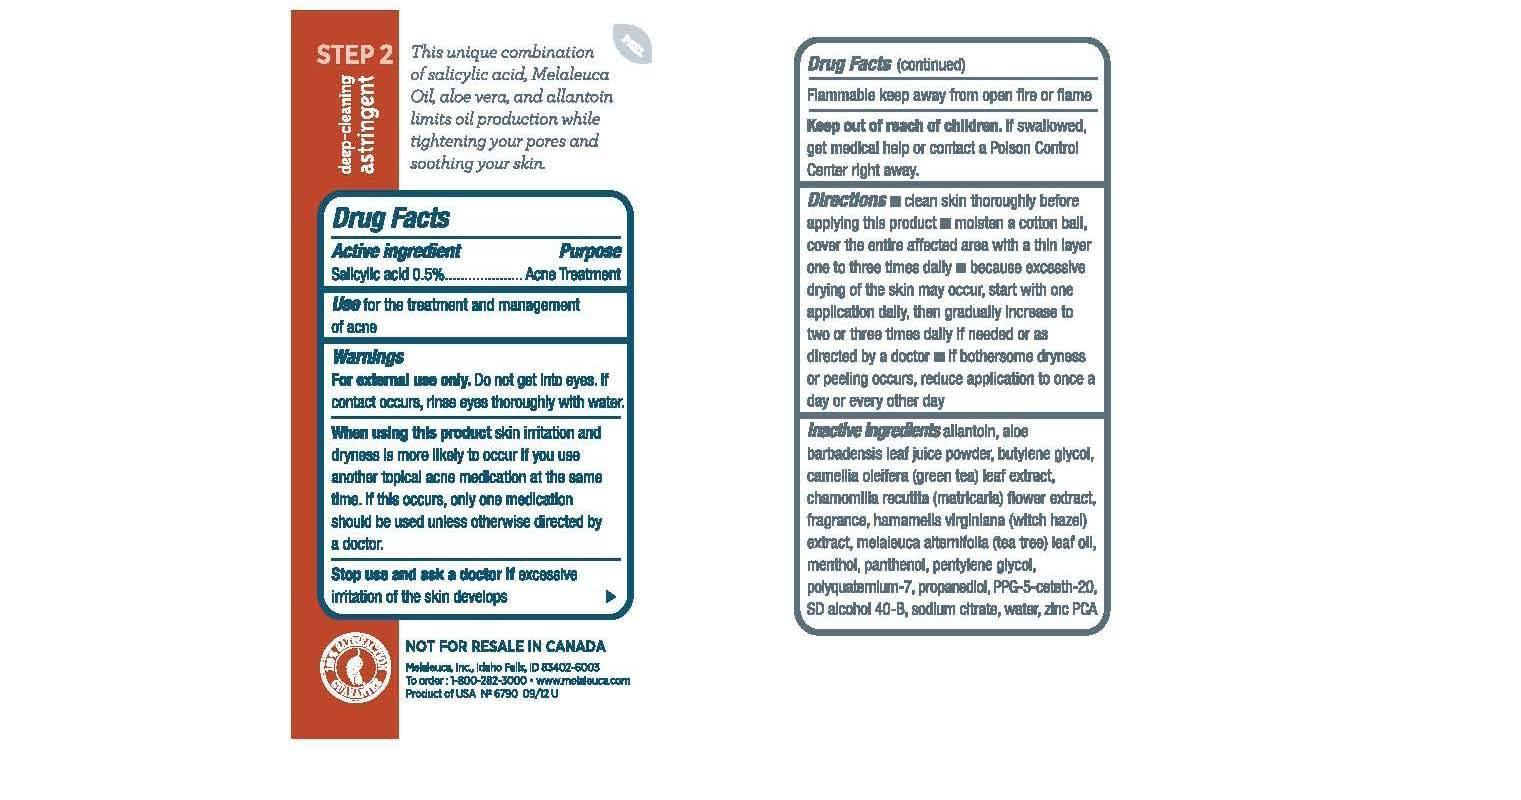 Clarity Clear Skin Essentials Deep-cleaning Astringent (Salicylic Acid) Liquid [Melaleuca, Inc.]